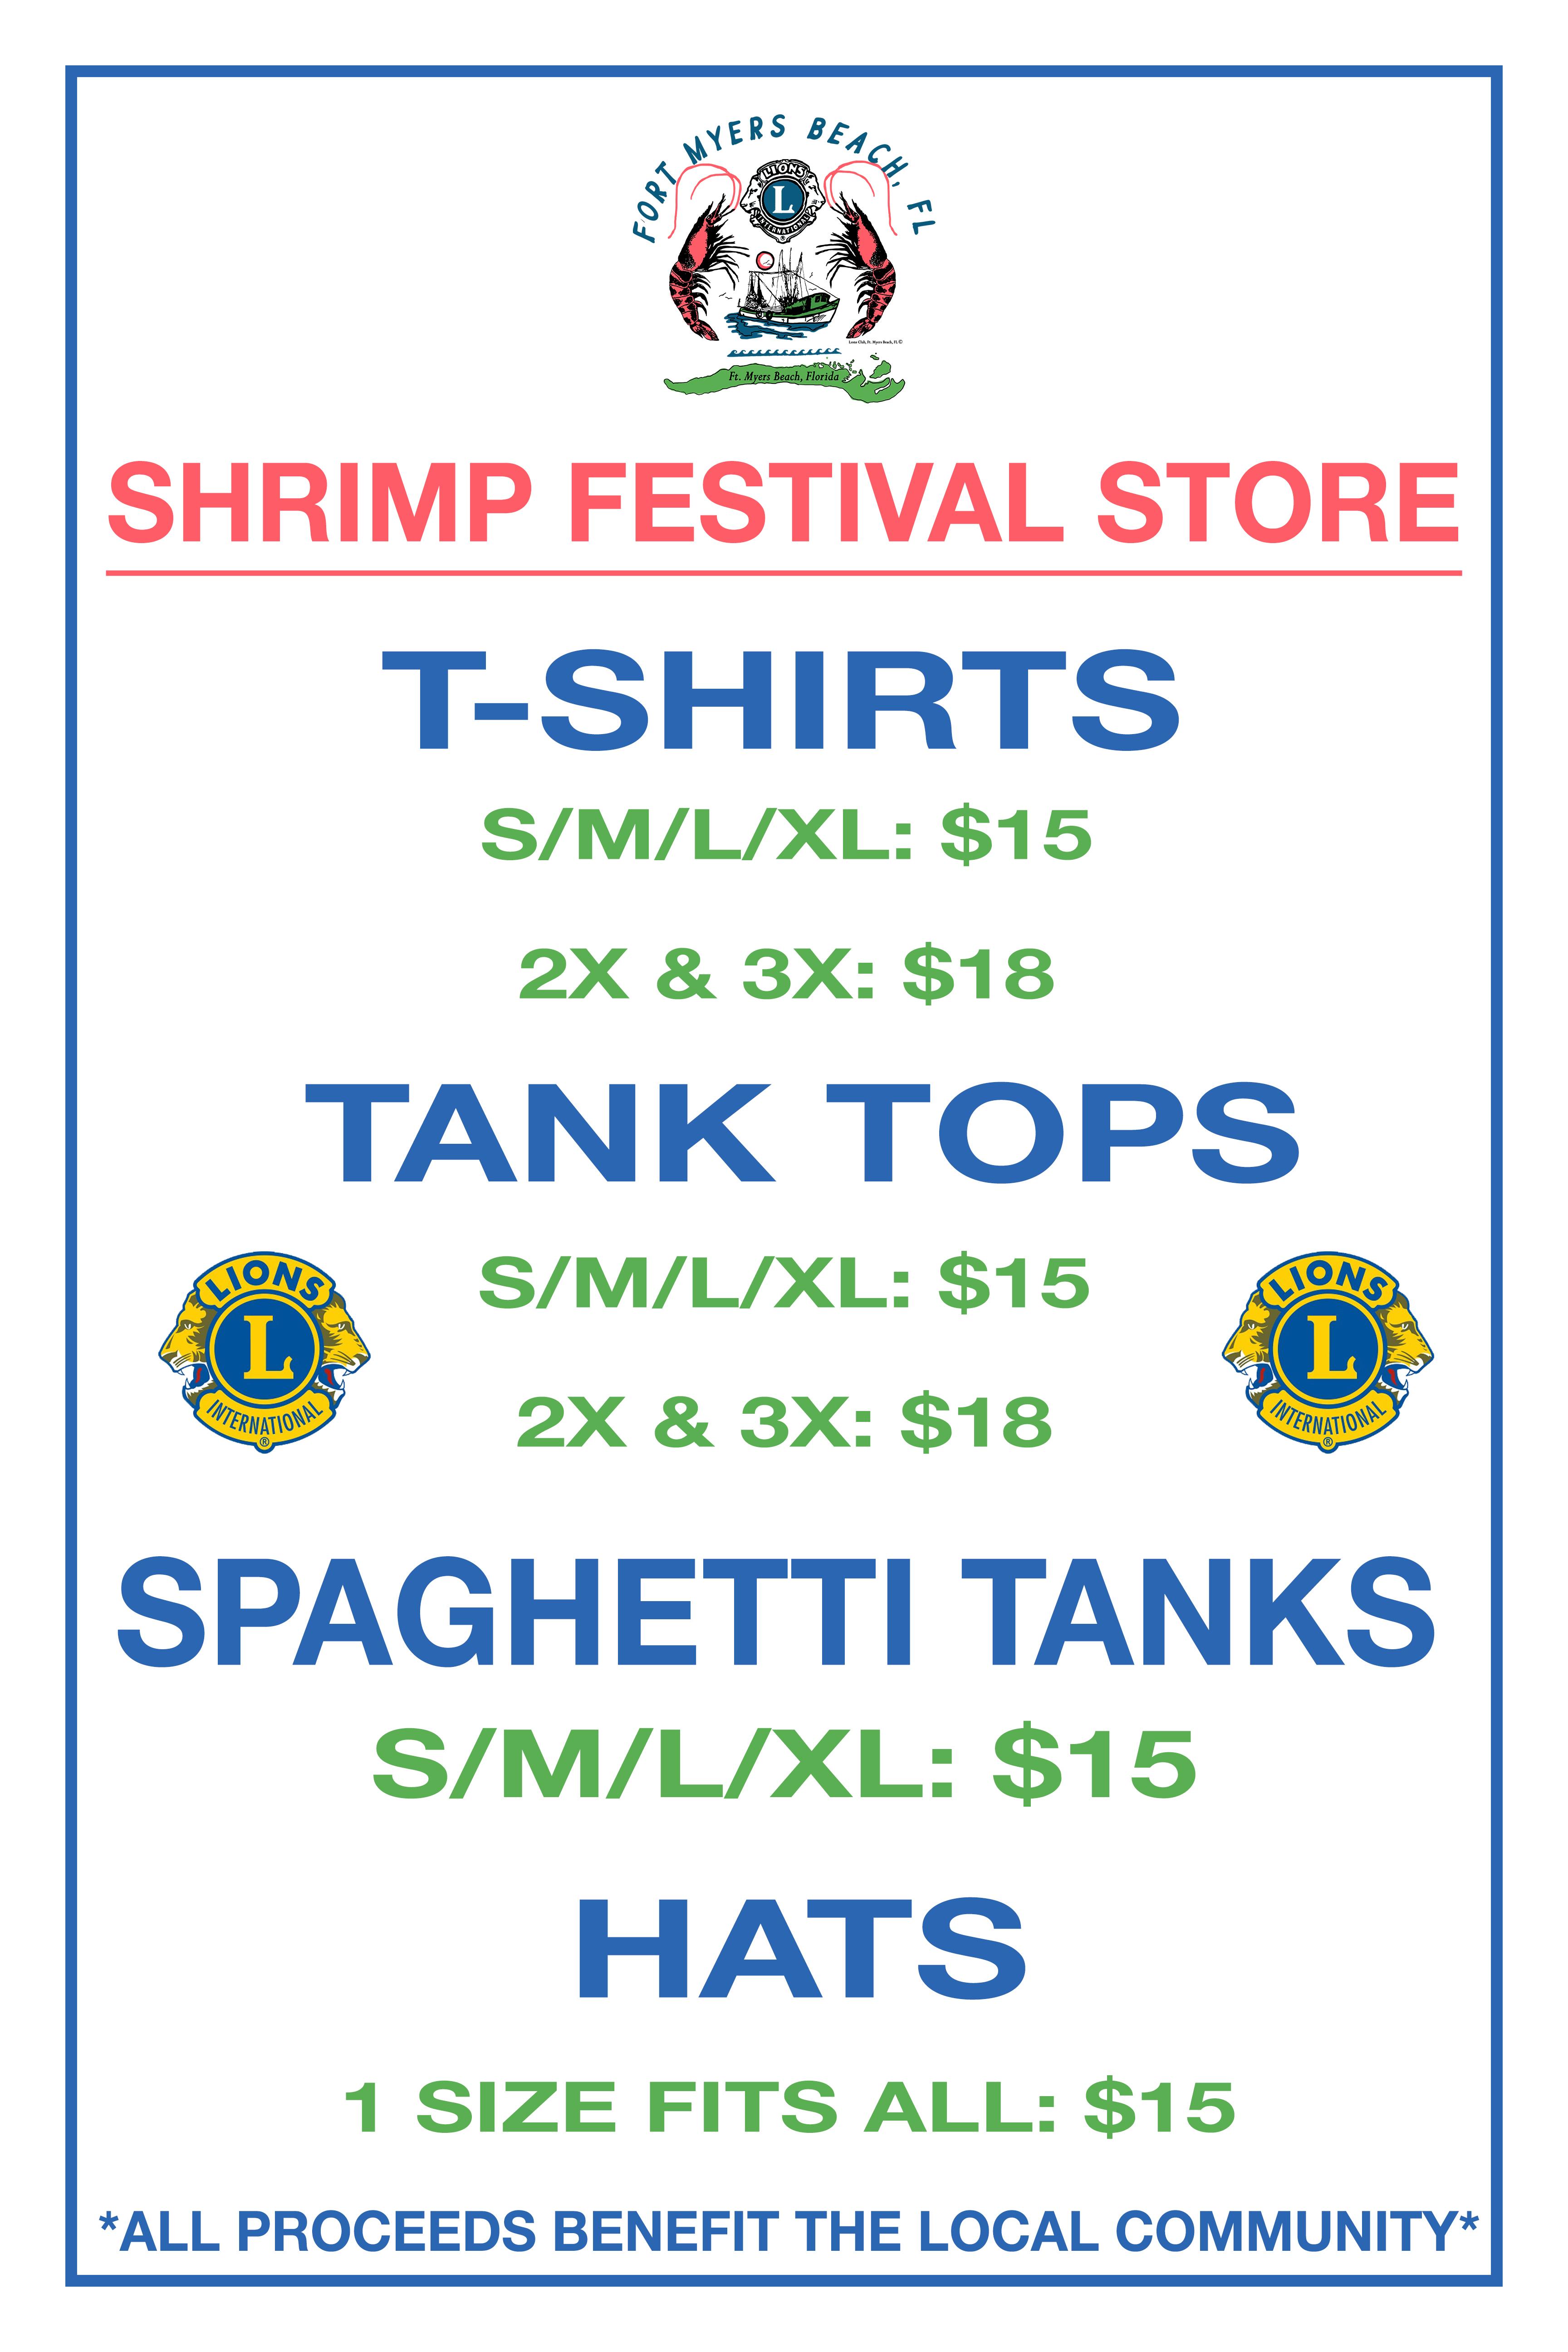 shrimp festival t-shirt